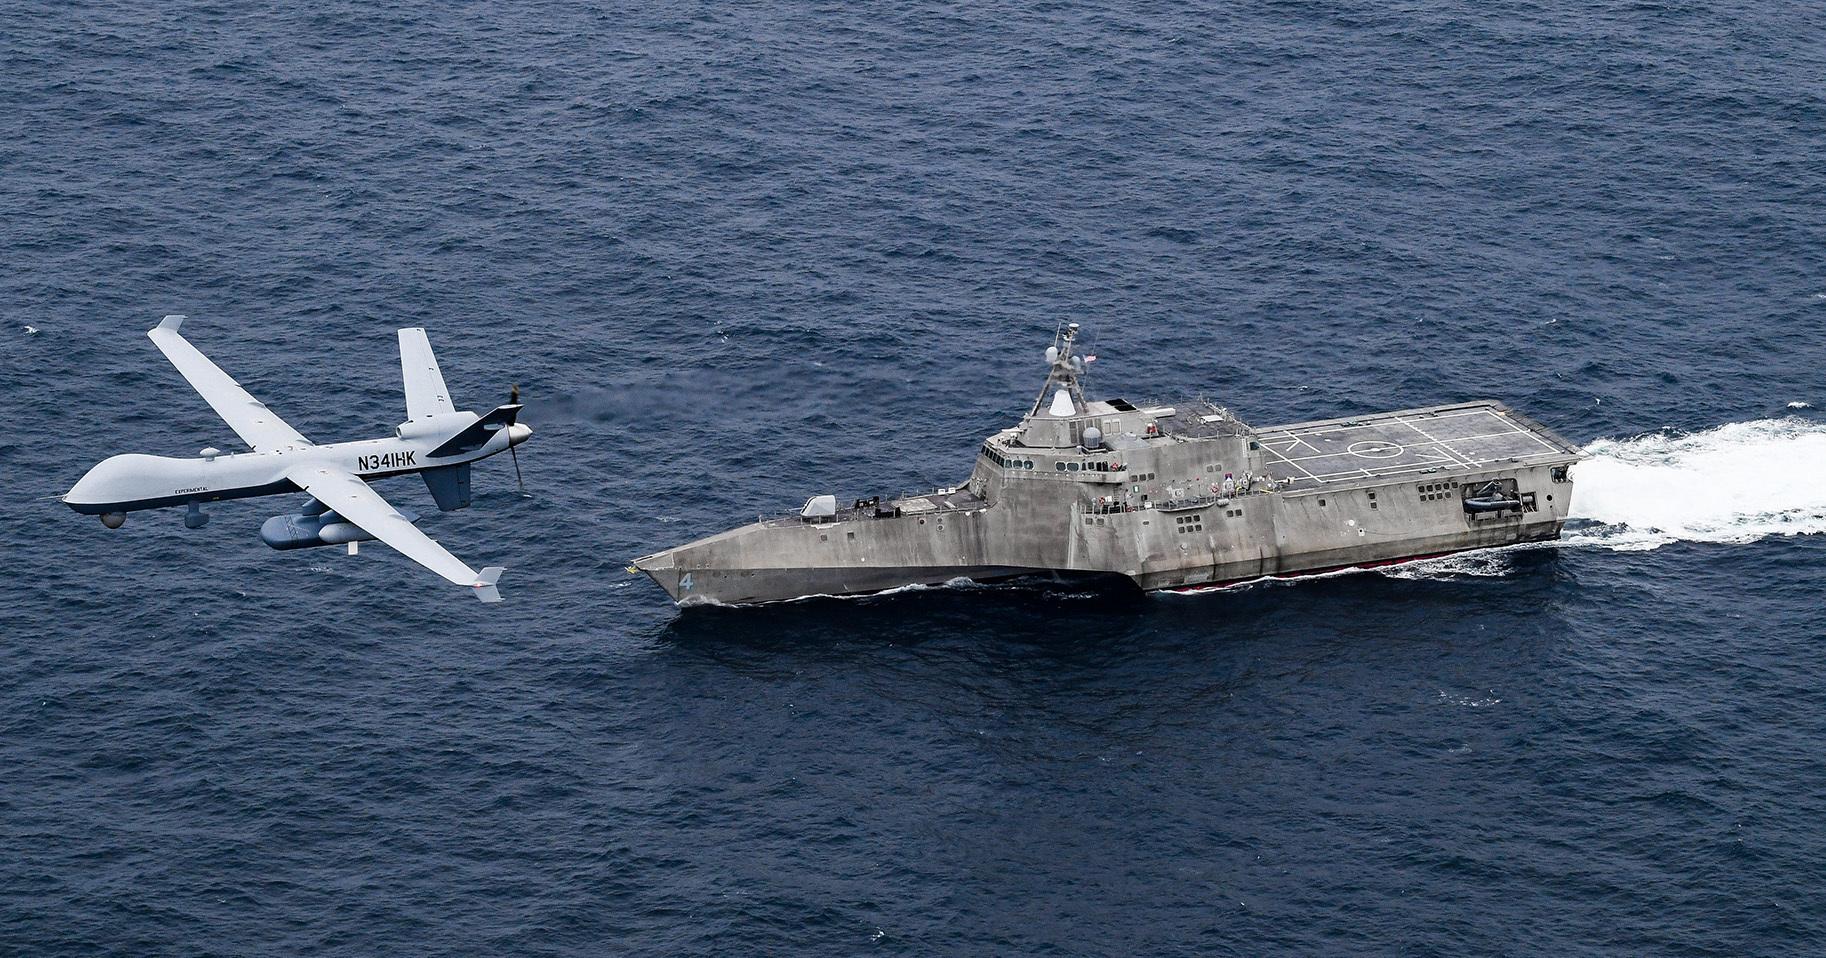 Sea Guardian: Το νέο drone του αμερικανικού Ναυτικού που θα φέρει την ανατροπή! [pics]